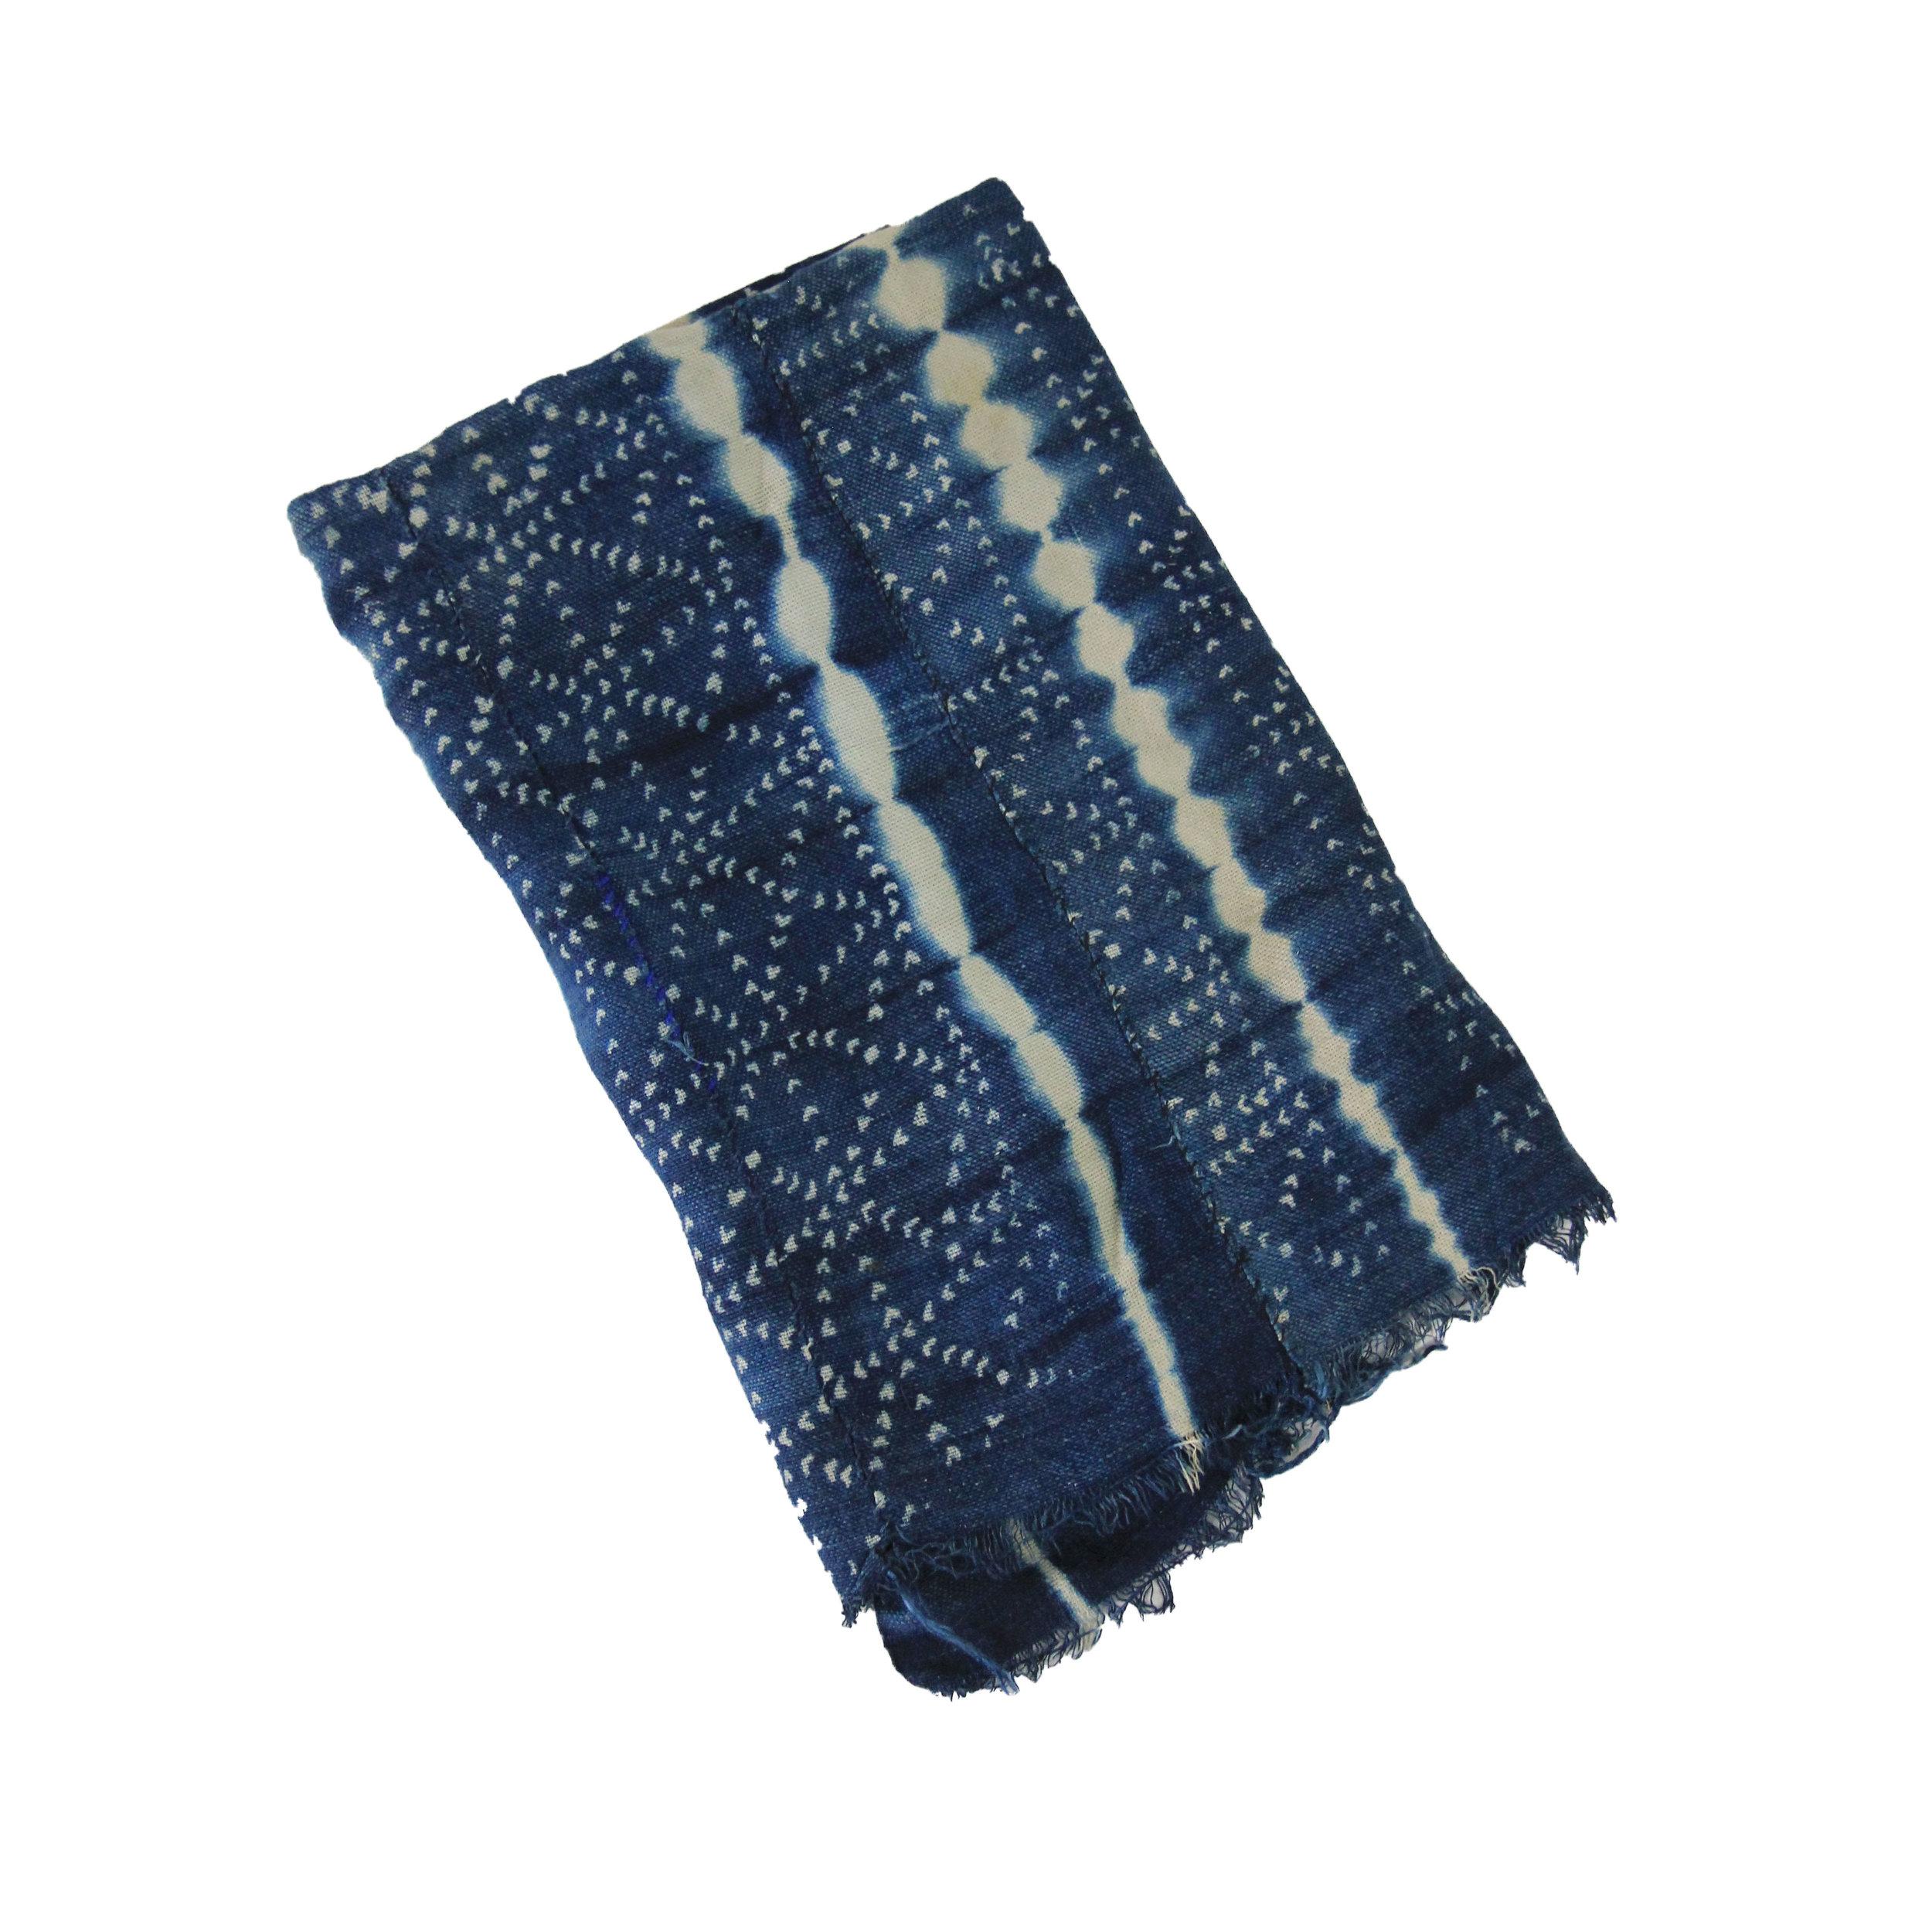 Vintage African Indigo Fabric